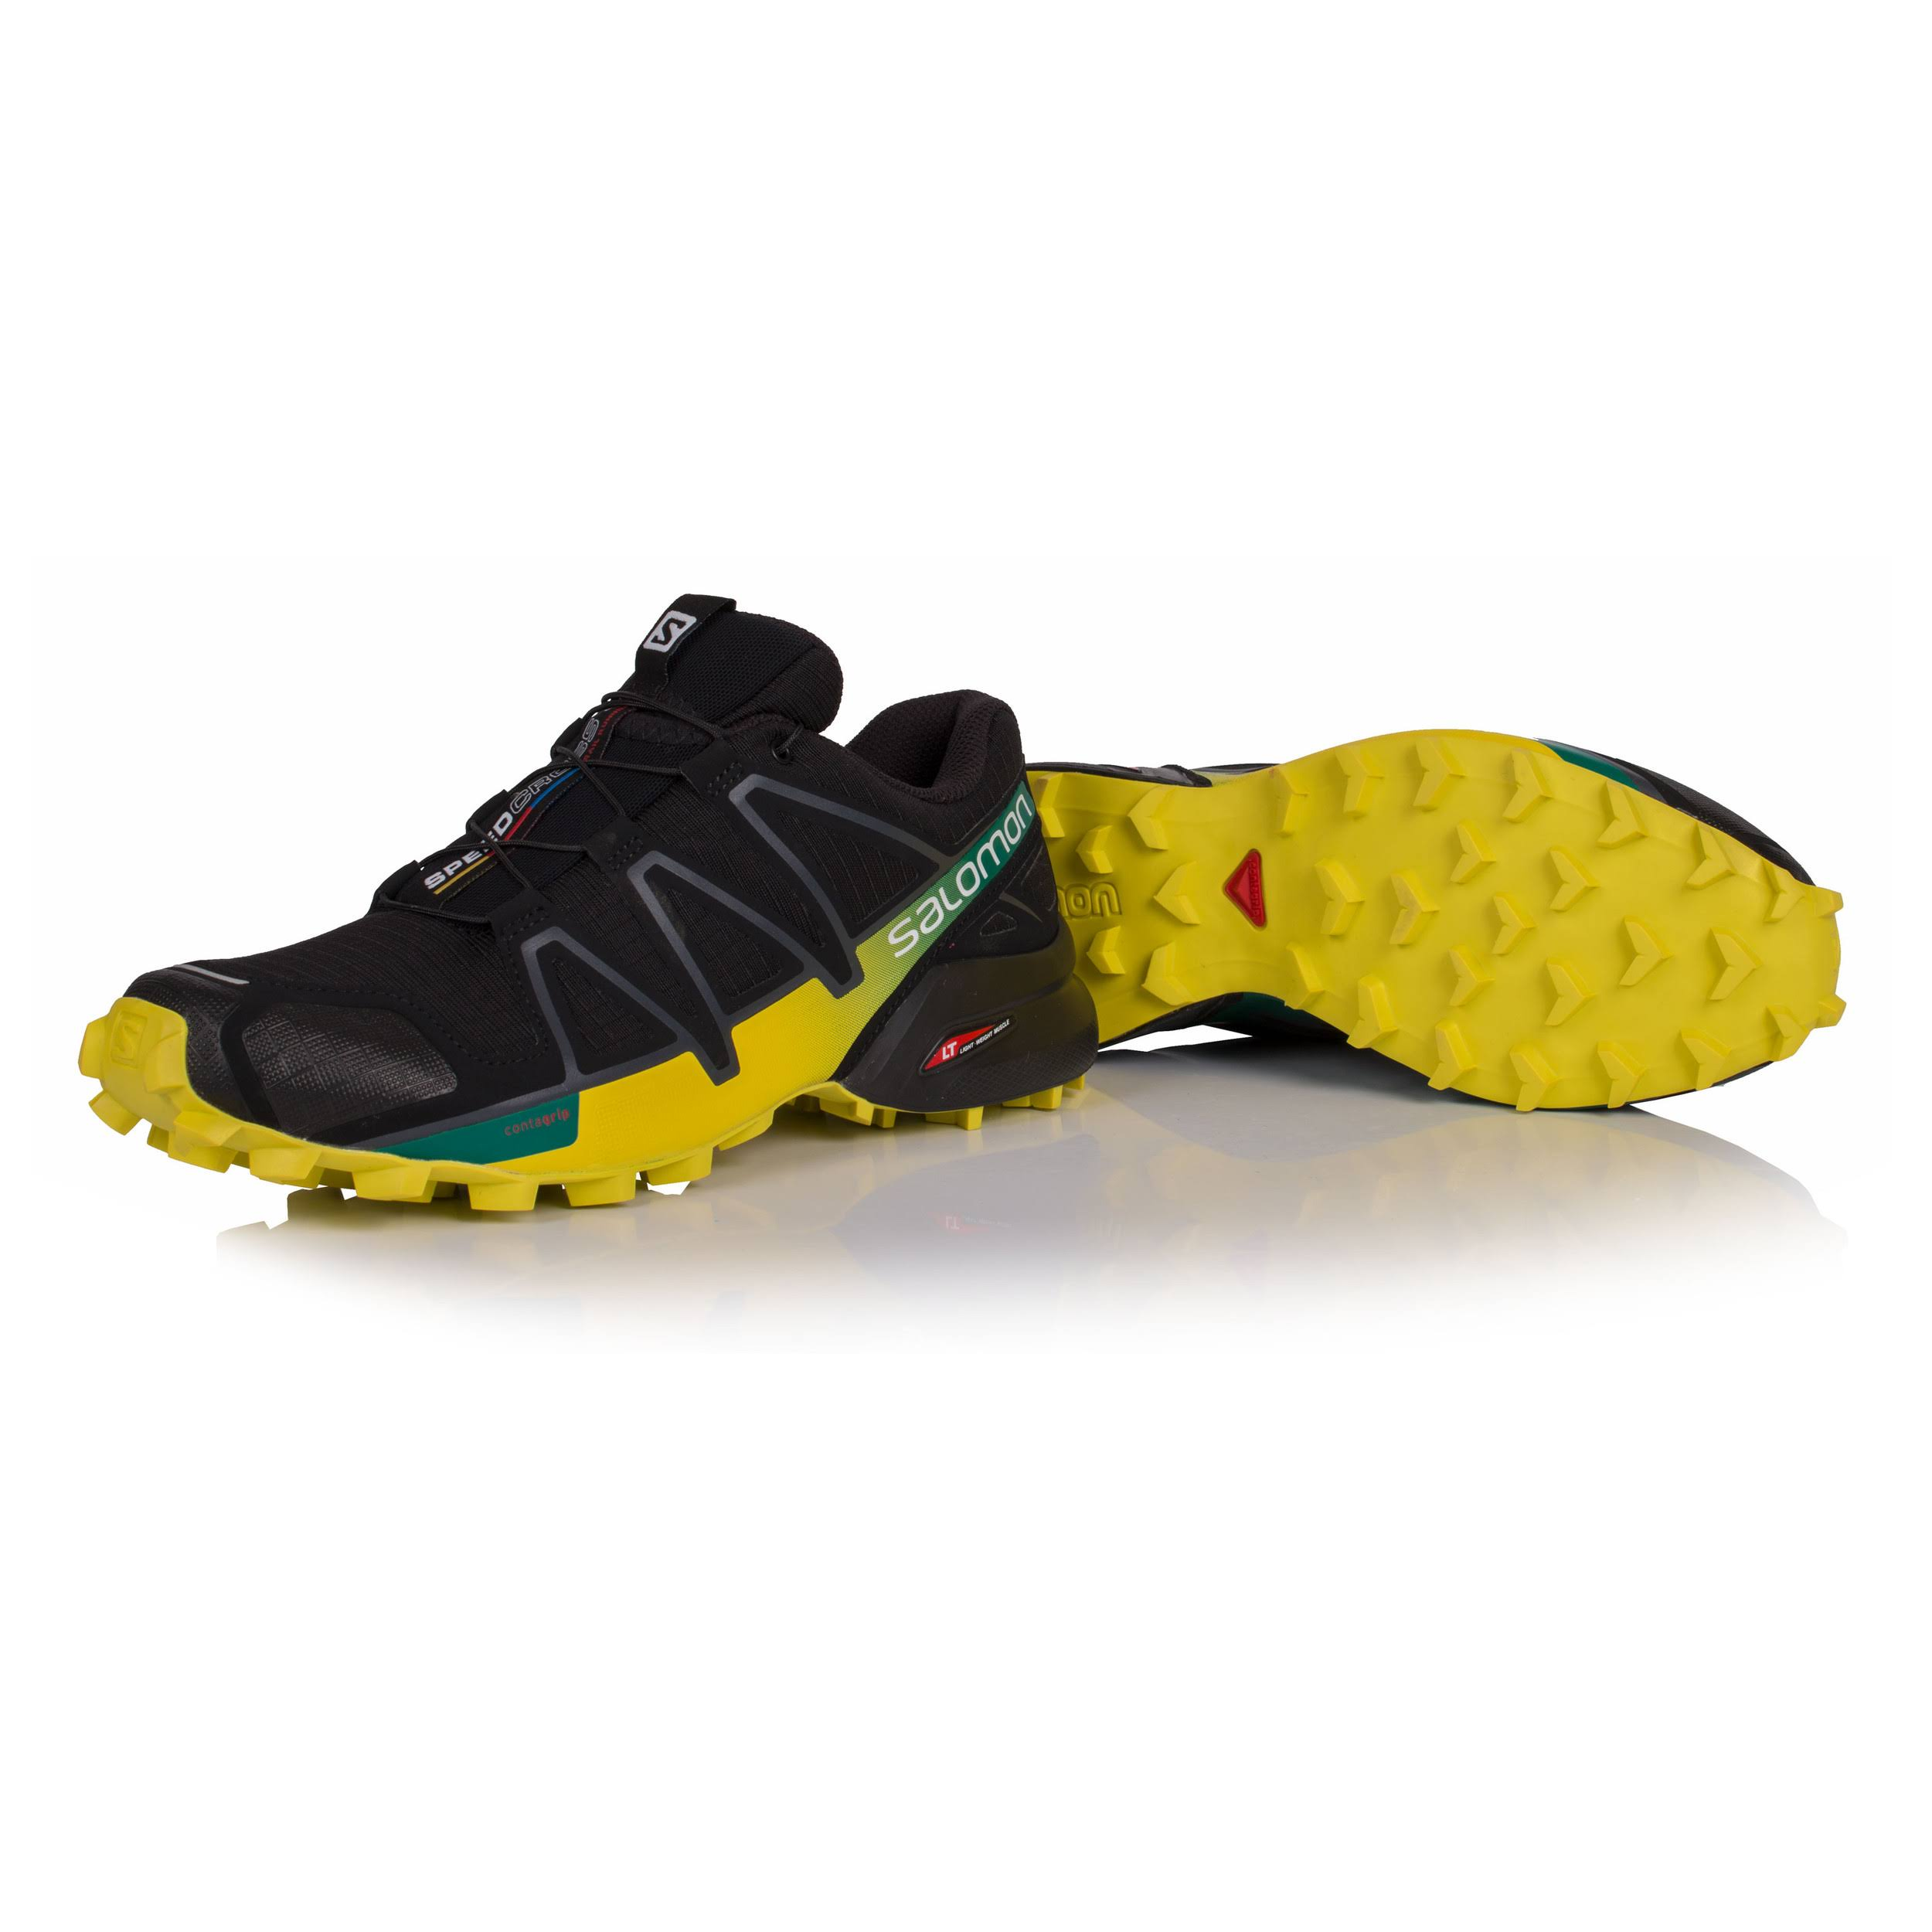 4 Black Salomon Fluorescent everglade sulphur Yellow Spring Black 392398 Speedcross wAq5qg